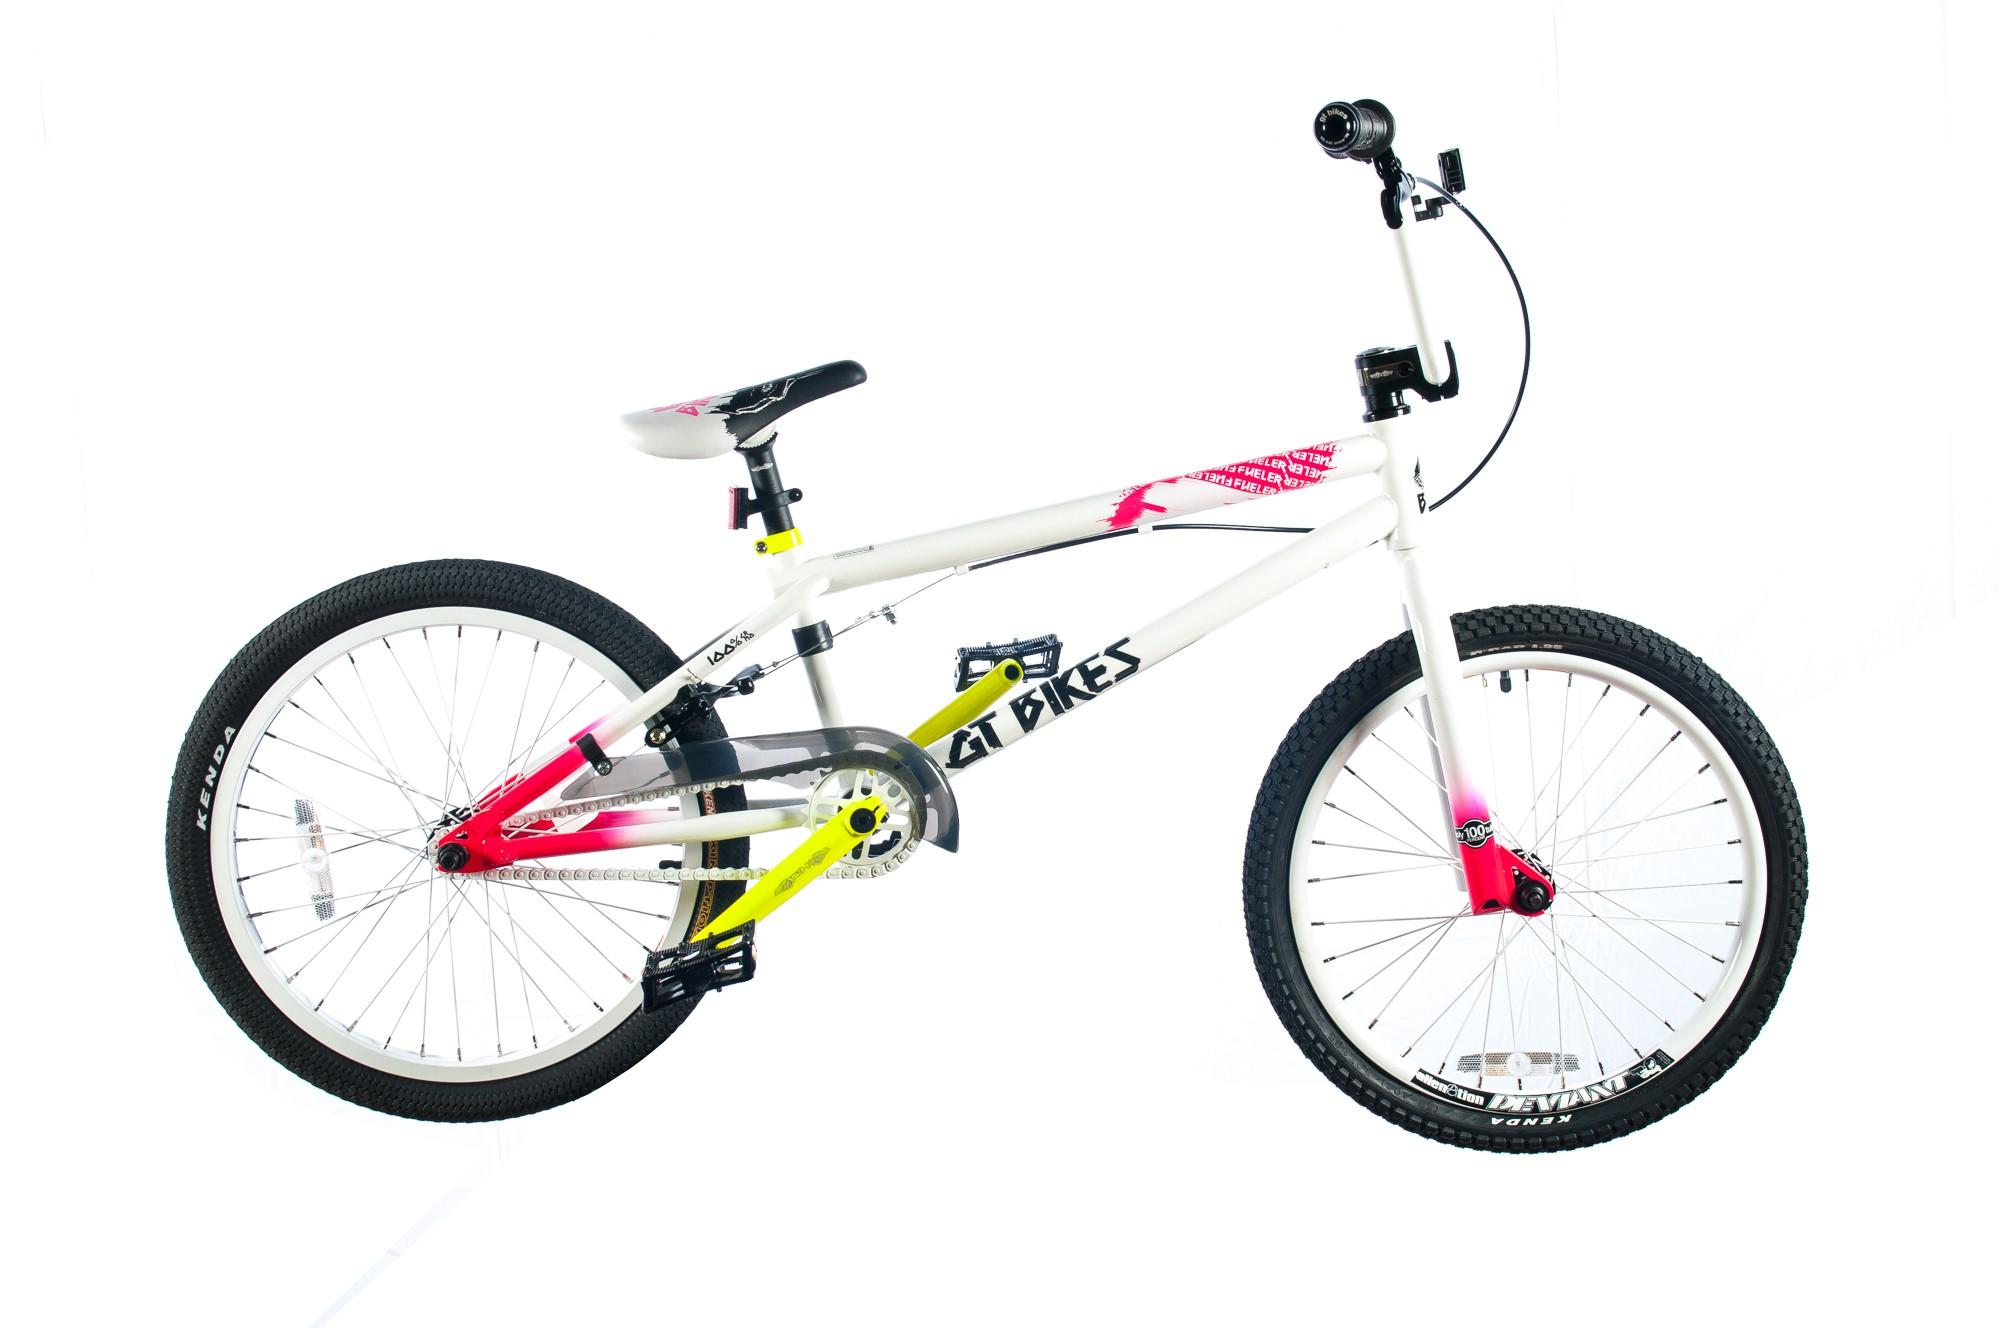 Gt bmx bicicletas diferentes dise os freestyle rad nuevo for Disenos para bicicletas